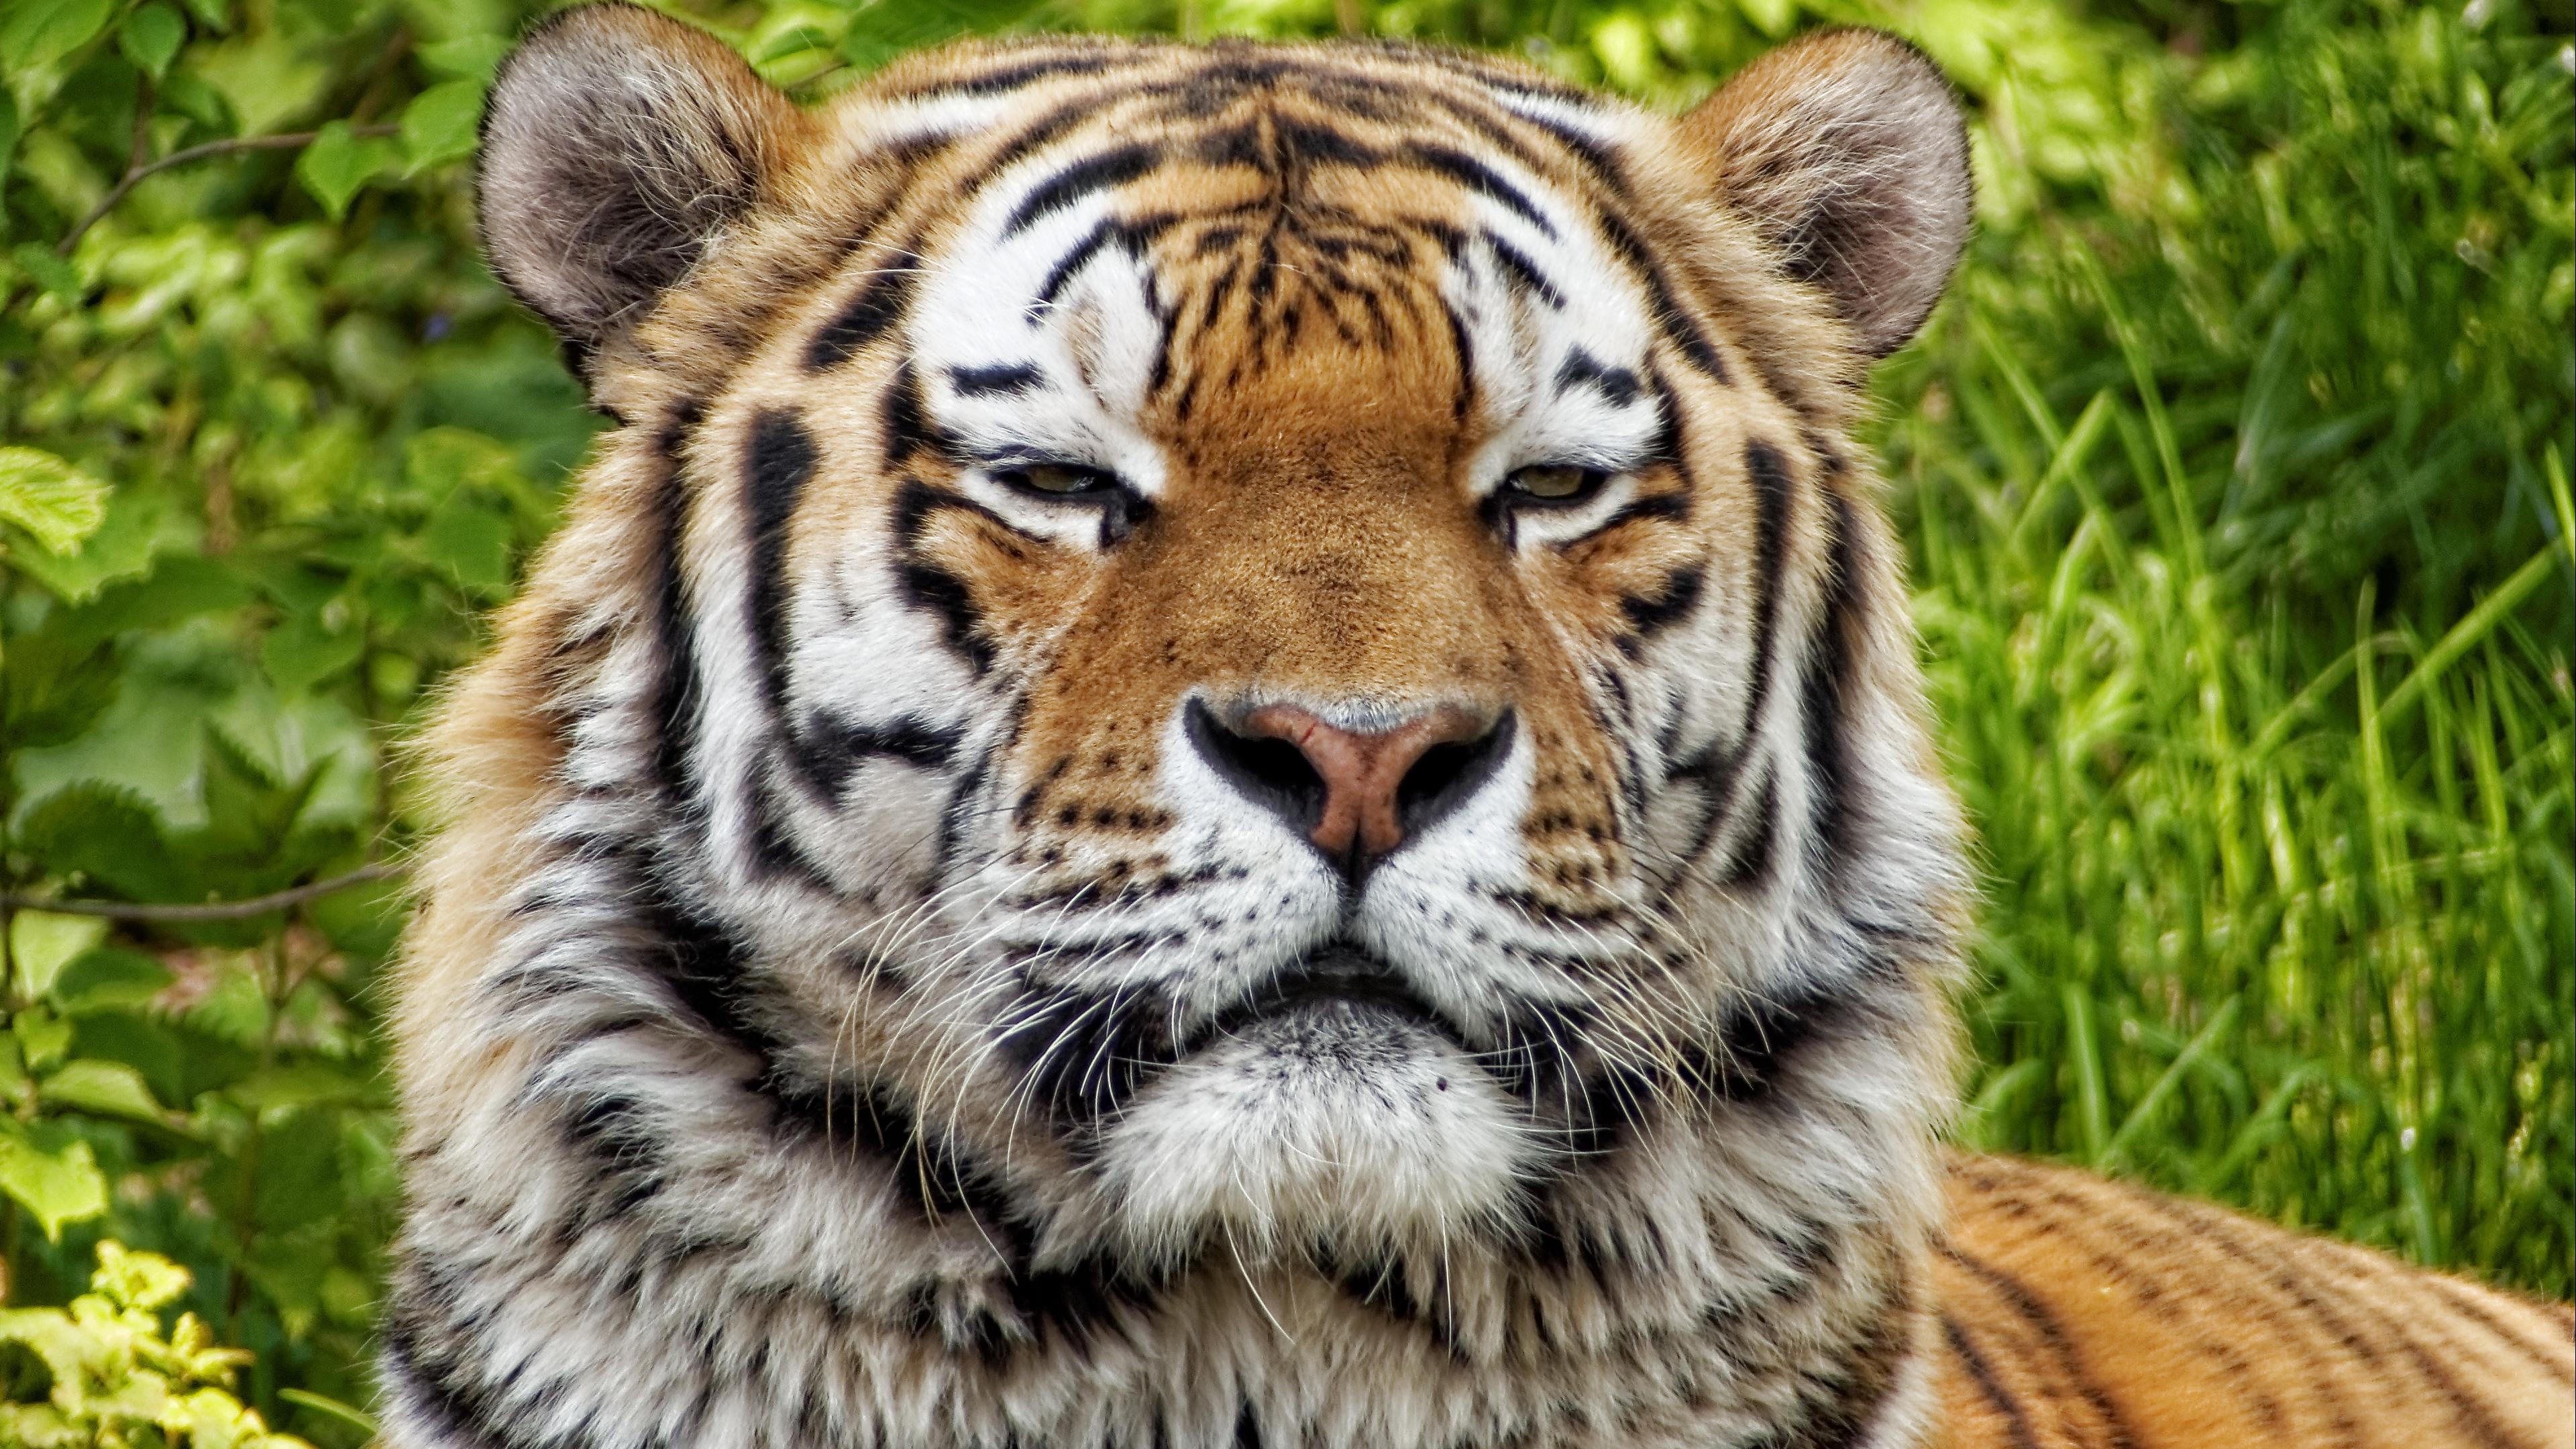 tiger predator muzzle big cat 4k 1542242445 - tiger, predator, muzzle, big cat 4k - Tiger, Predator, muzzle